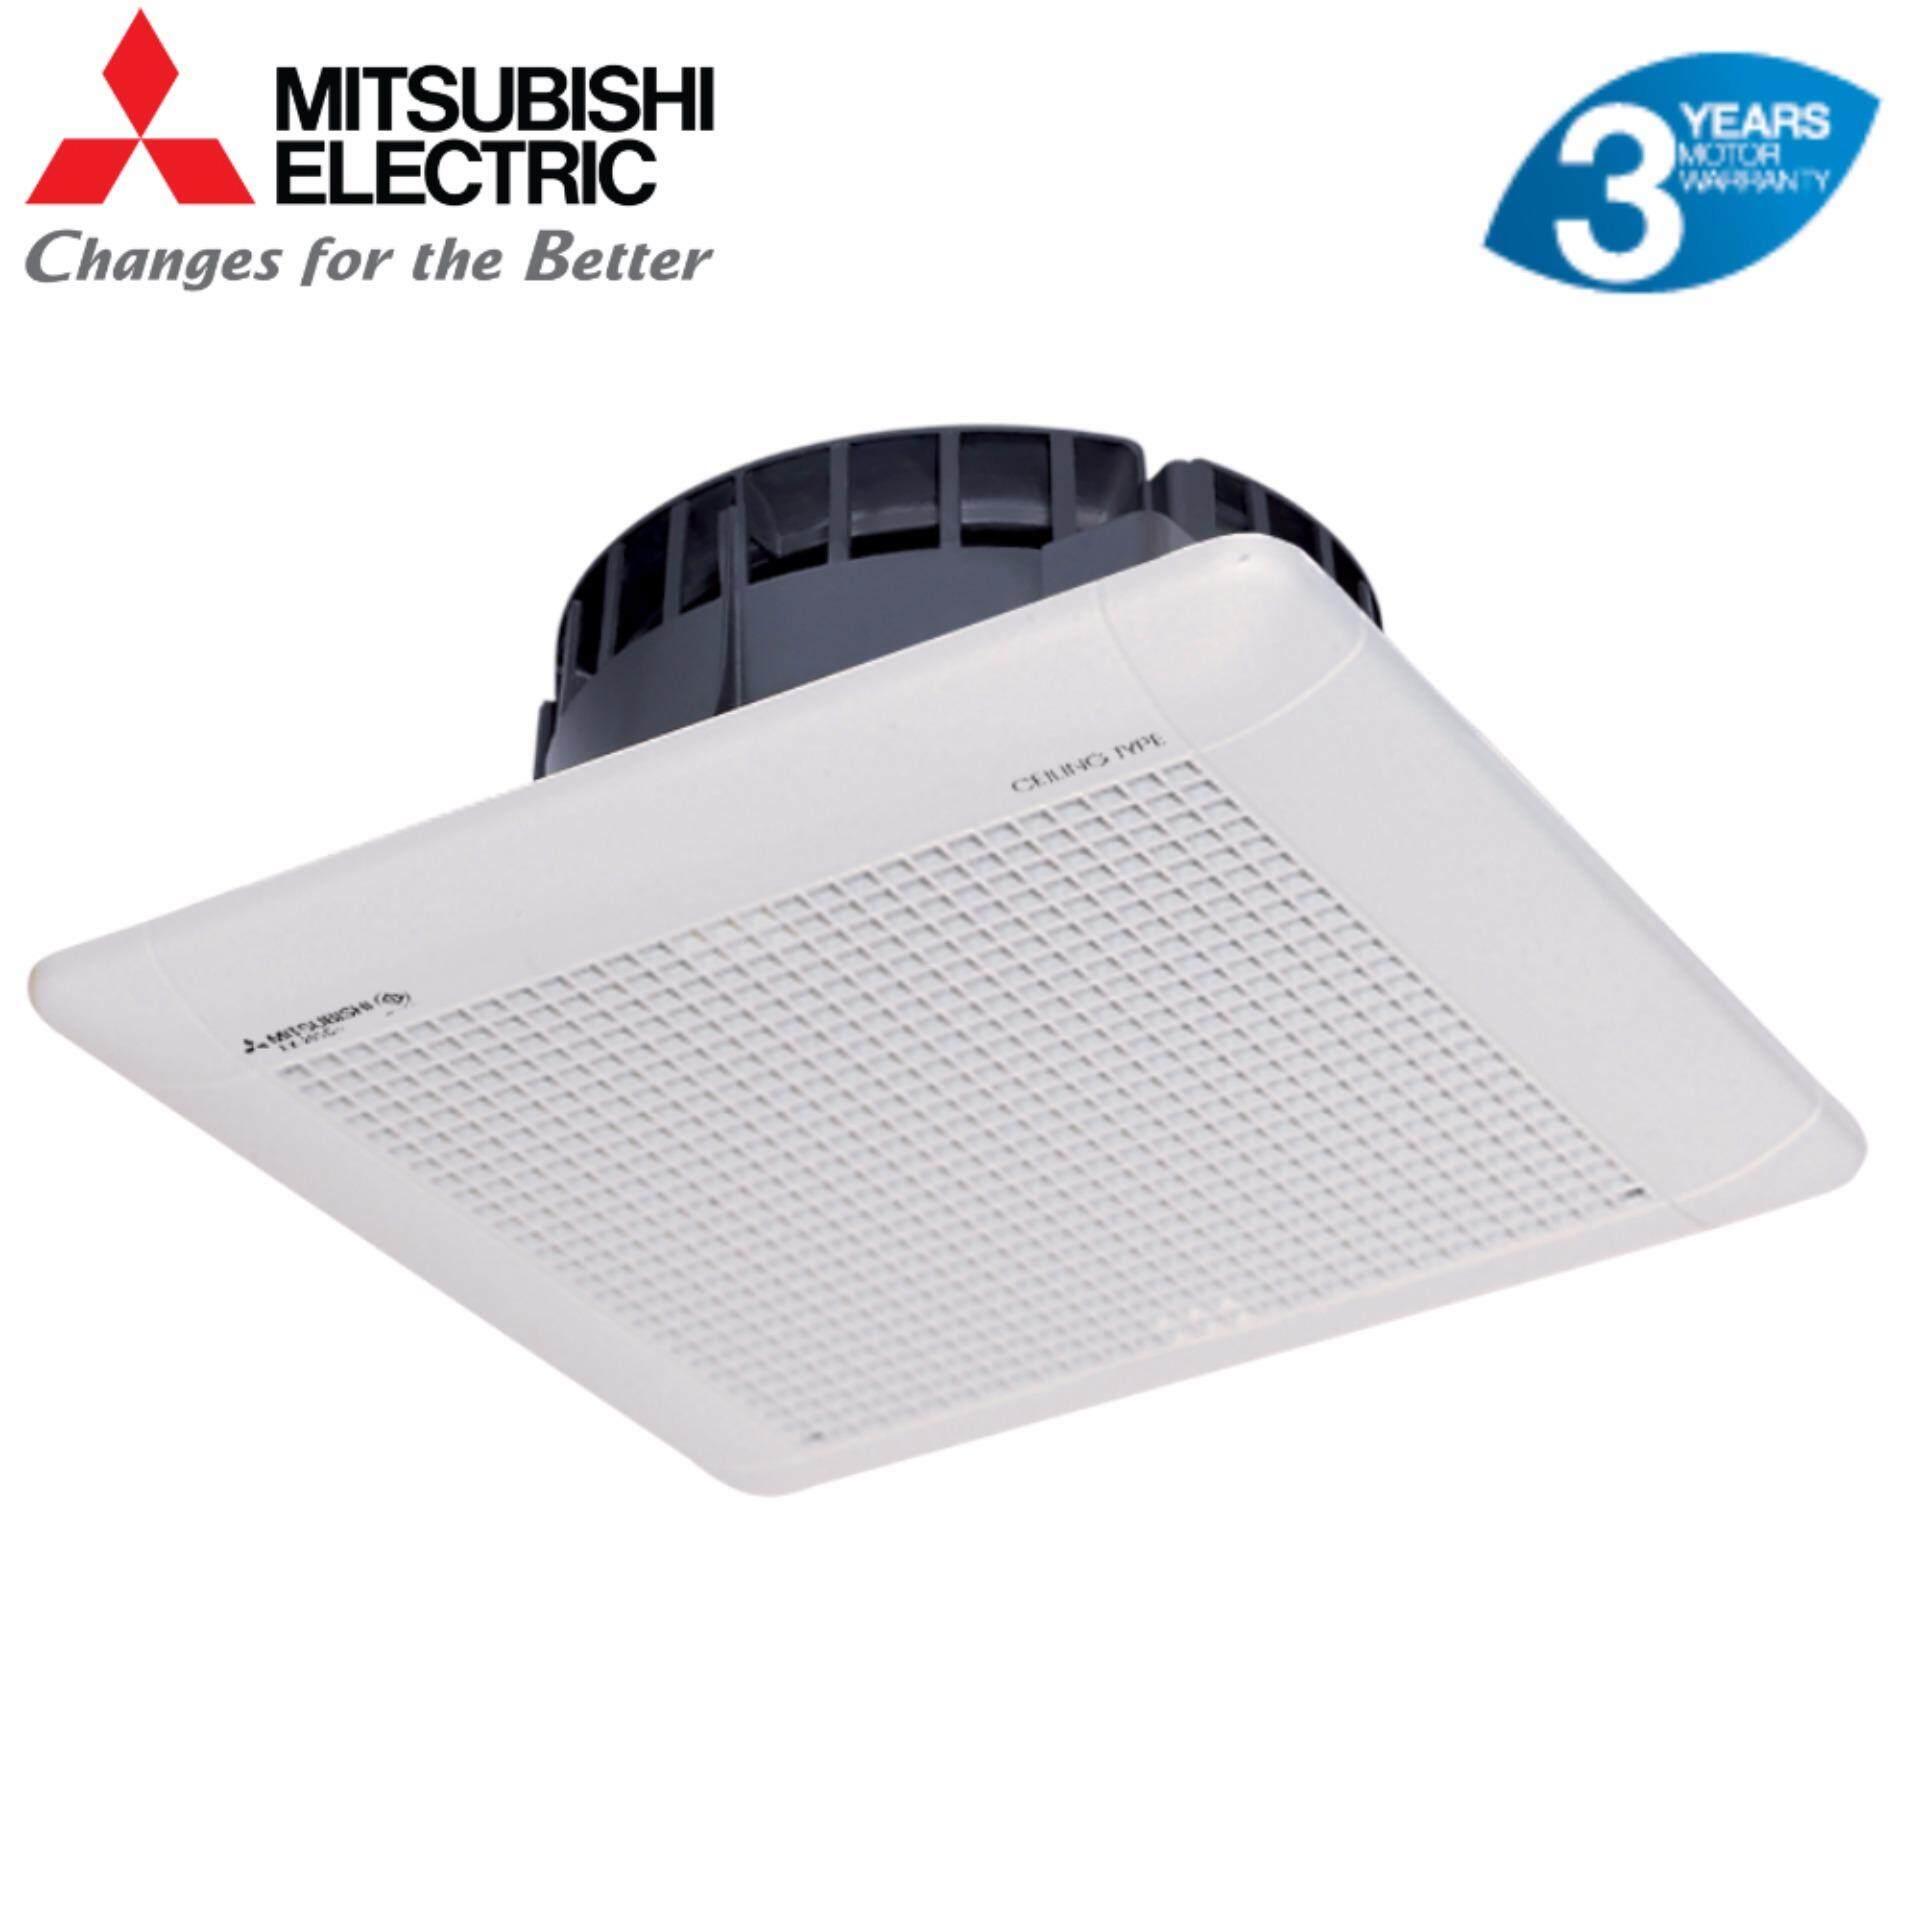 Rams 196 tra media shelf ikea powder coated fibreboard makes the surface - Mitsubishi Ex 20sc5t 8 Inch Ceiling Type Ventilation Exhaust Fan